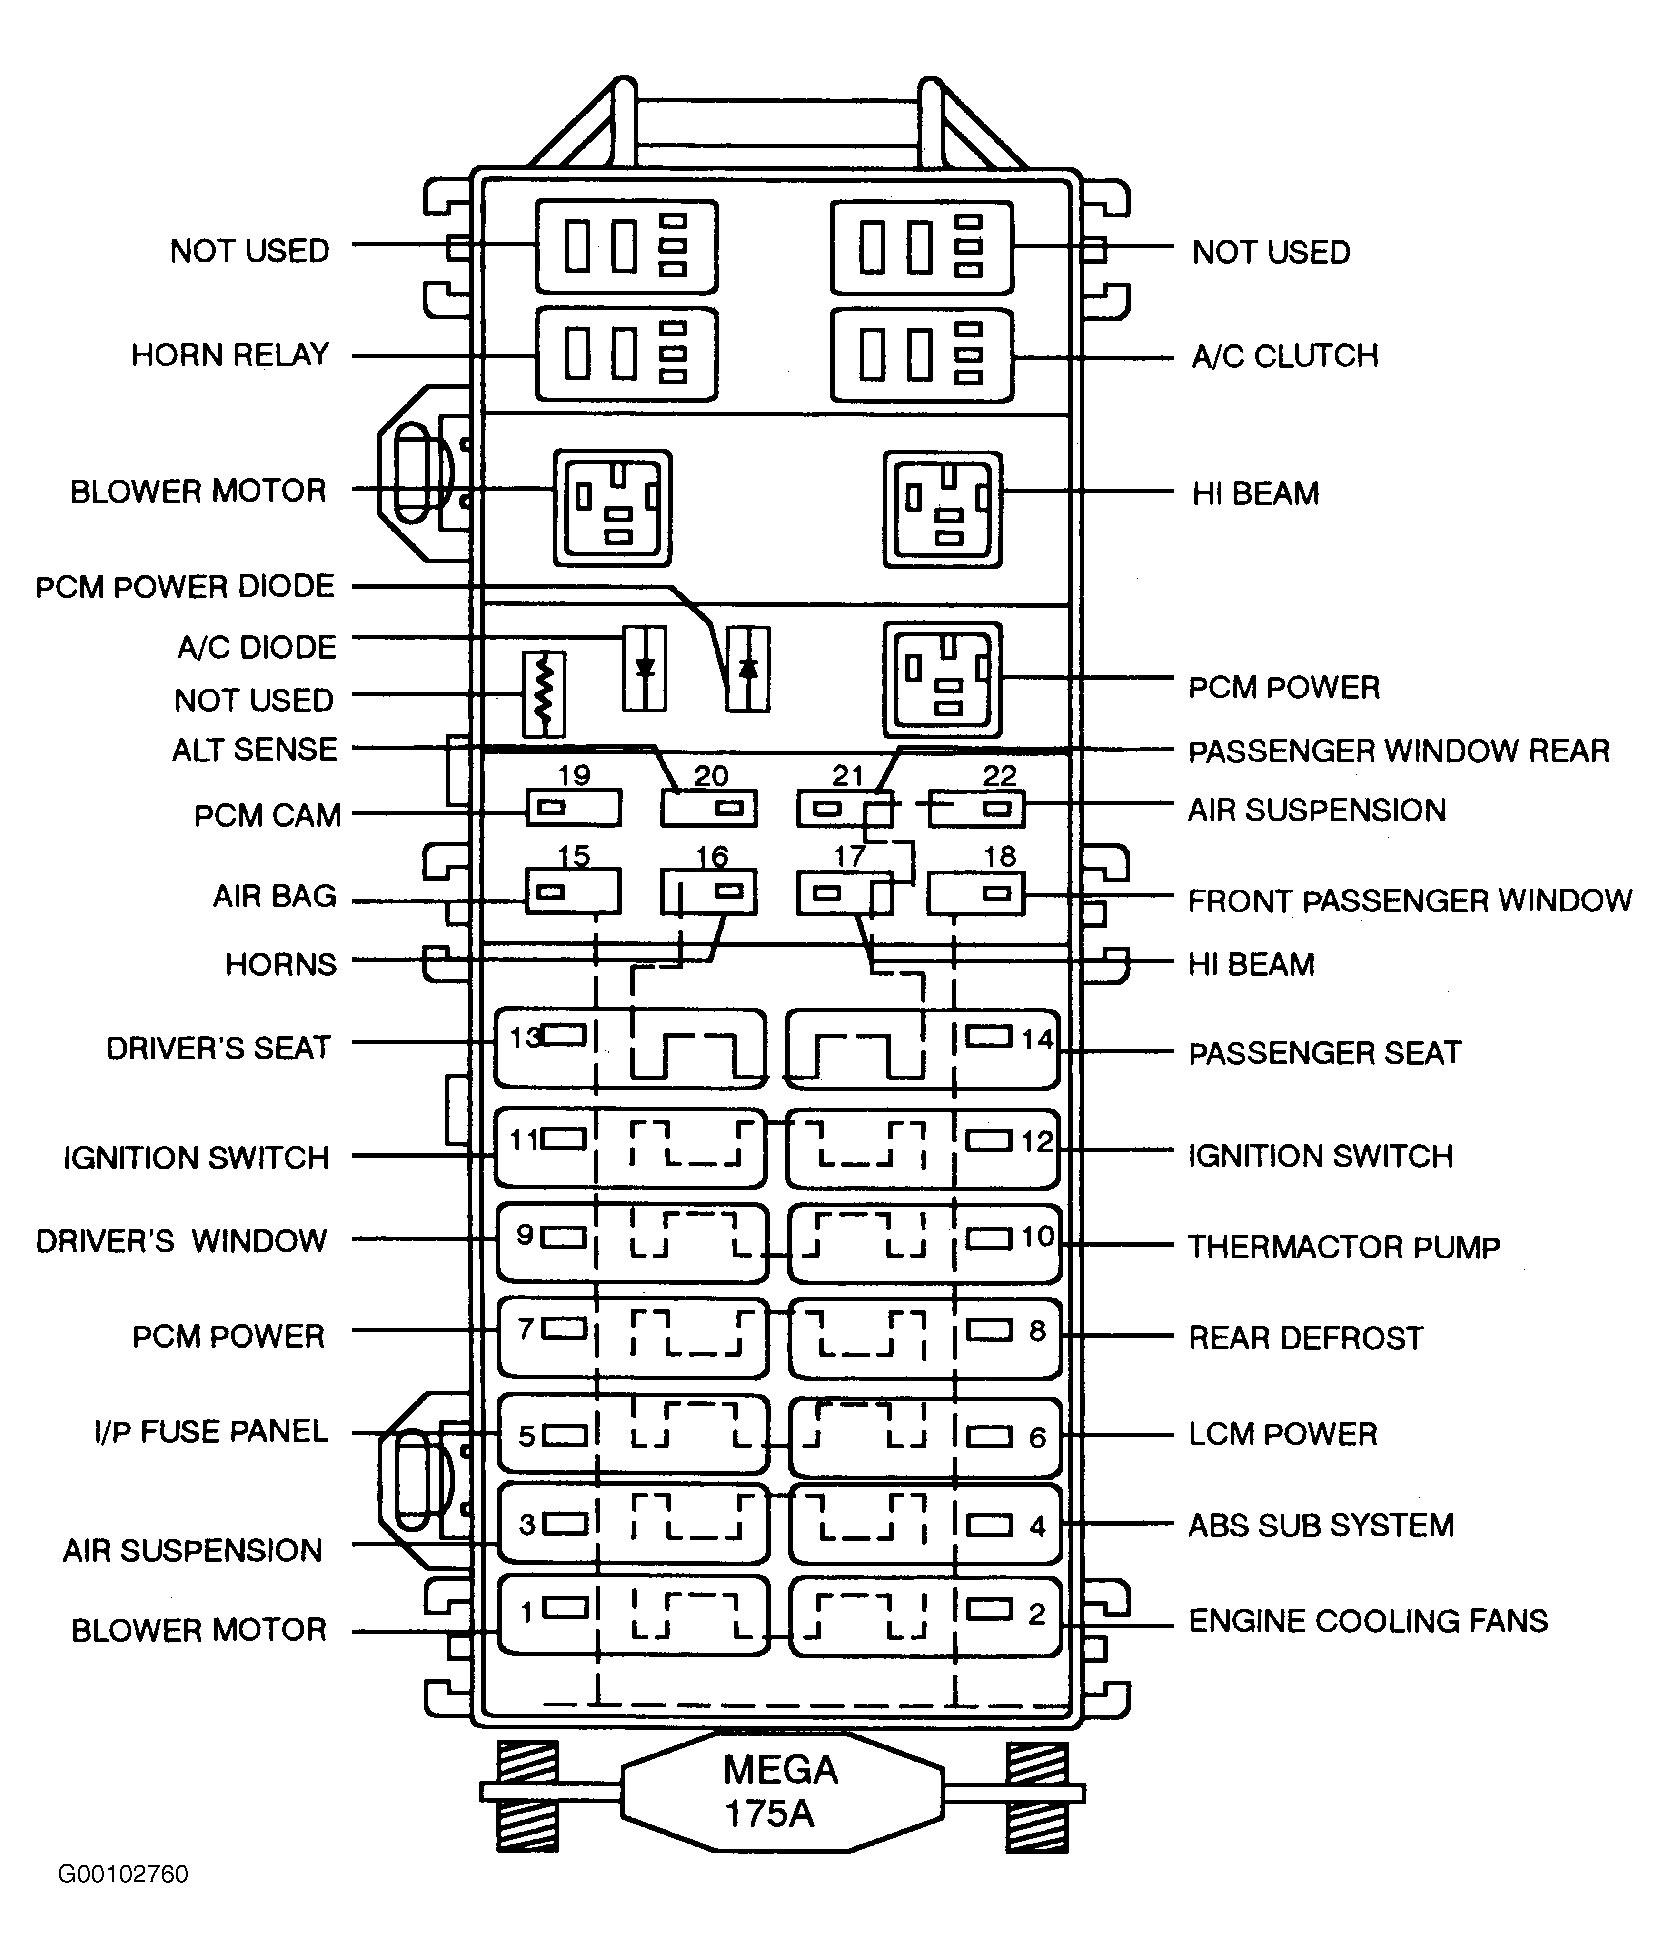 car fuse diagram 2012 f-150 fuse box diagram 91 town car fuse diagram simple